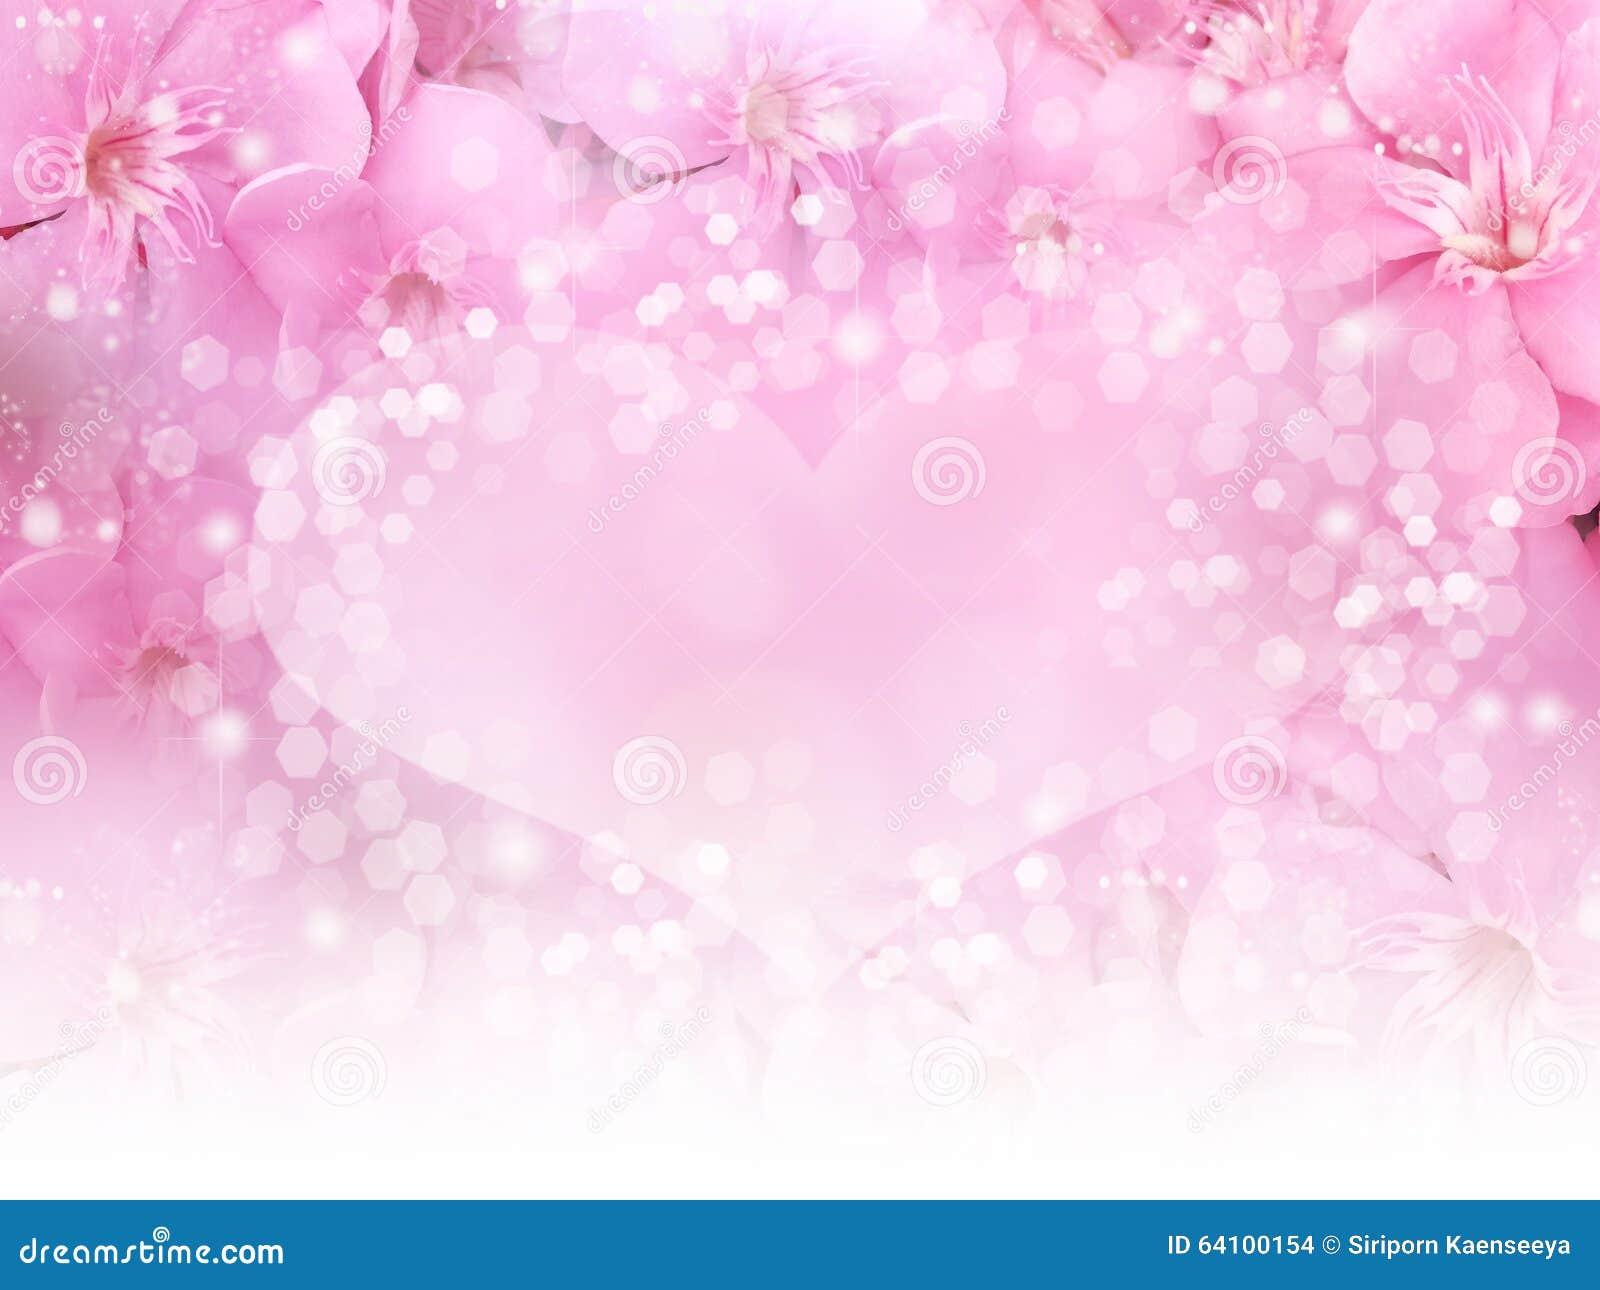 Pink flower border and heart bokeh background for wedding card or pink flower border and heart bokeh background for wedding card or valentine concept stock photo 64100154 megapixl mightylinksfo